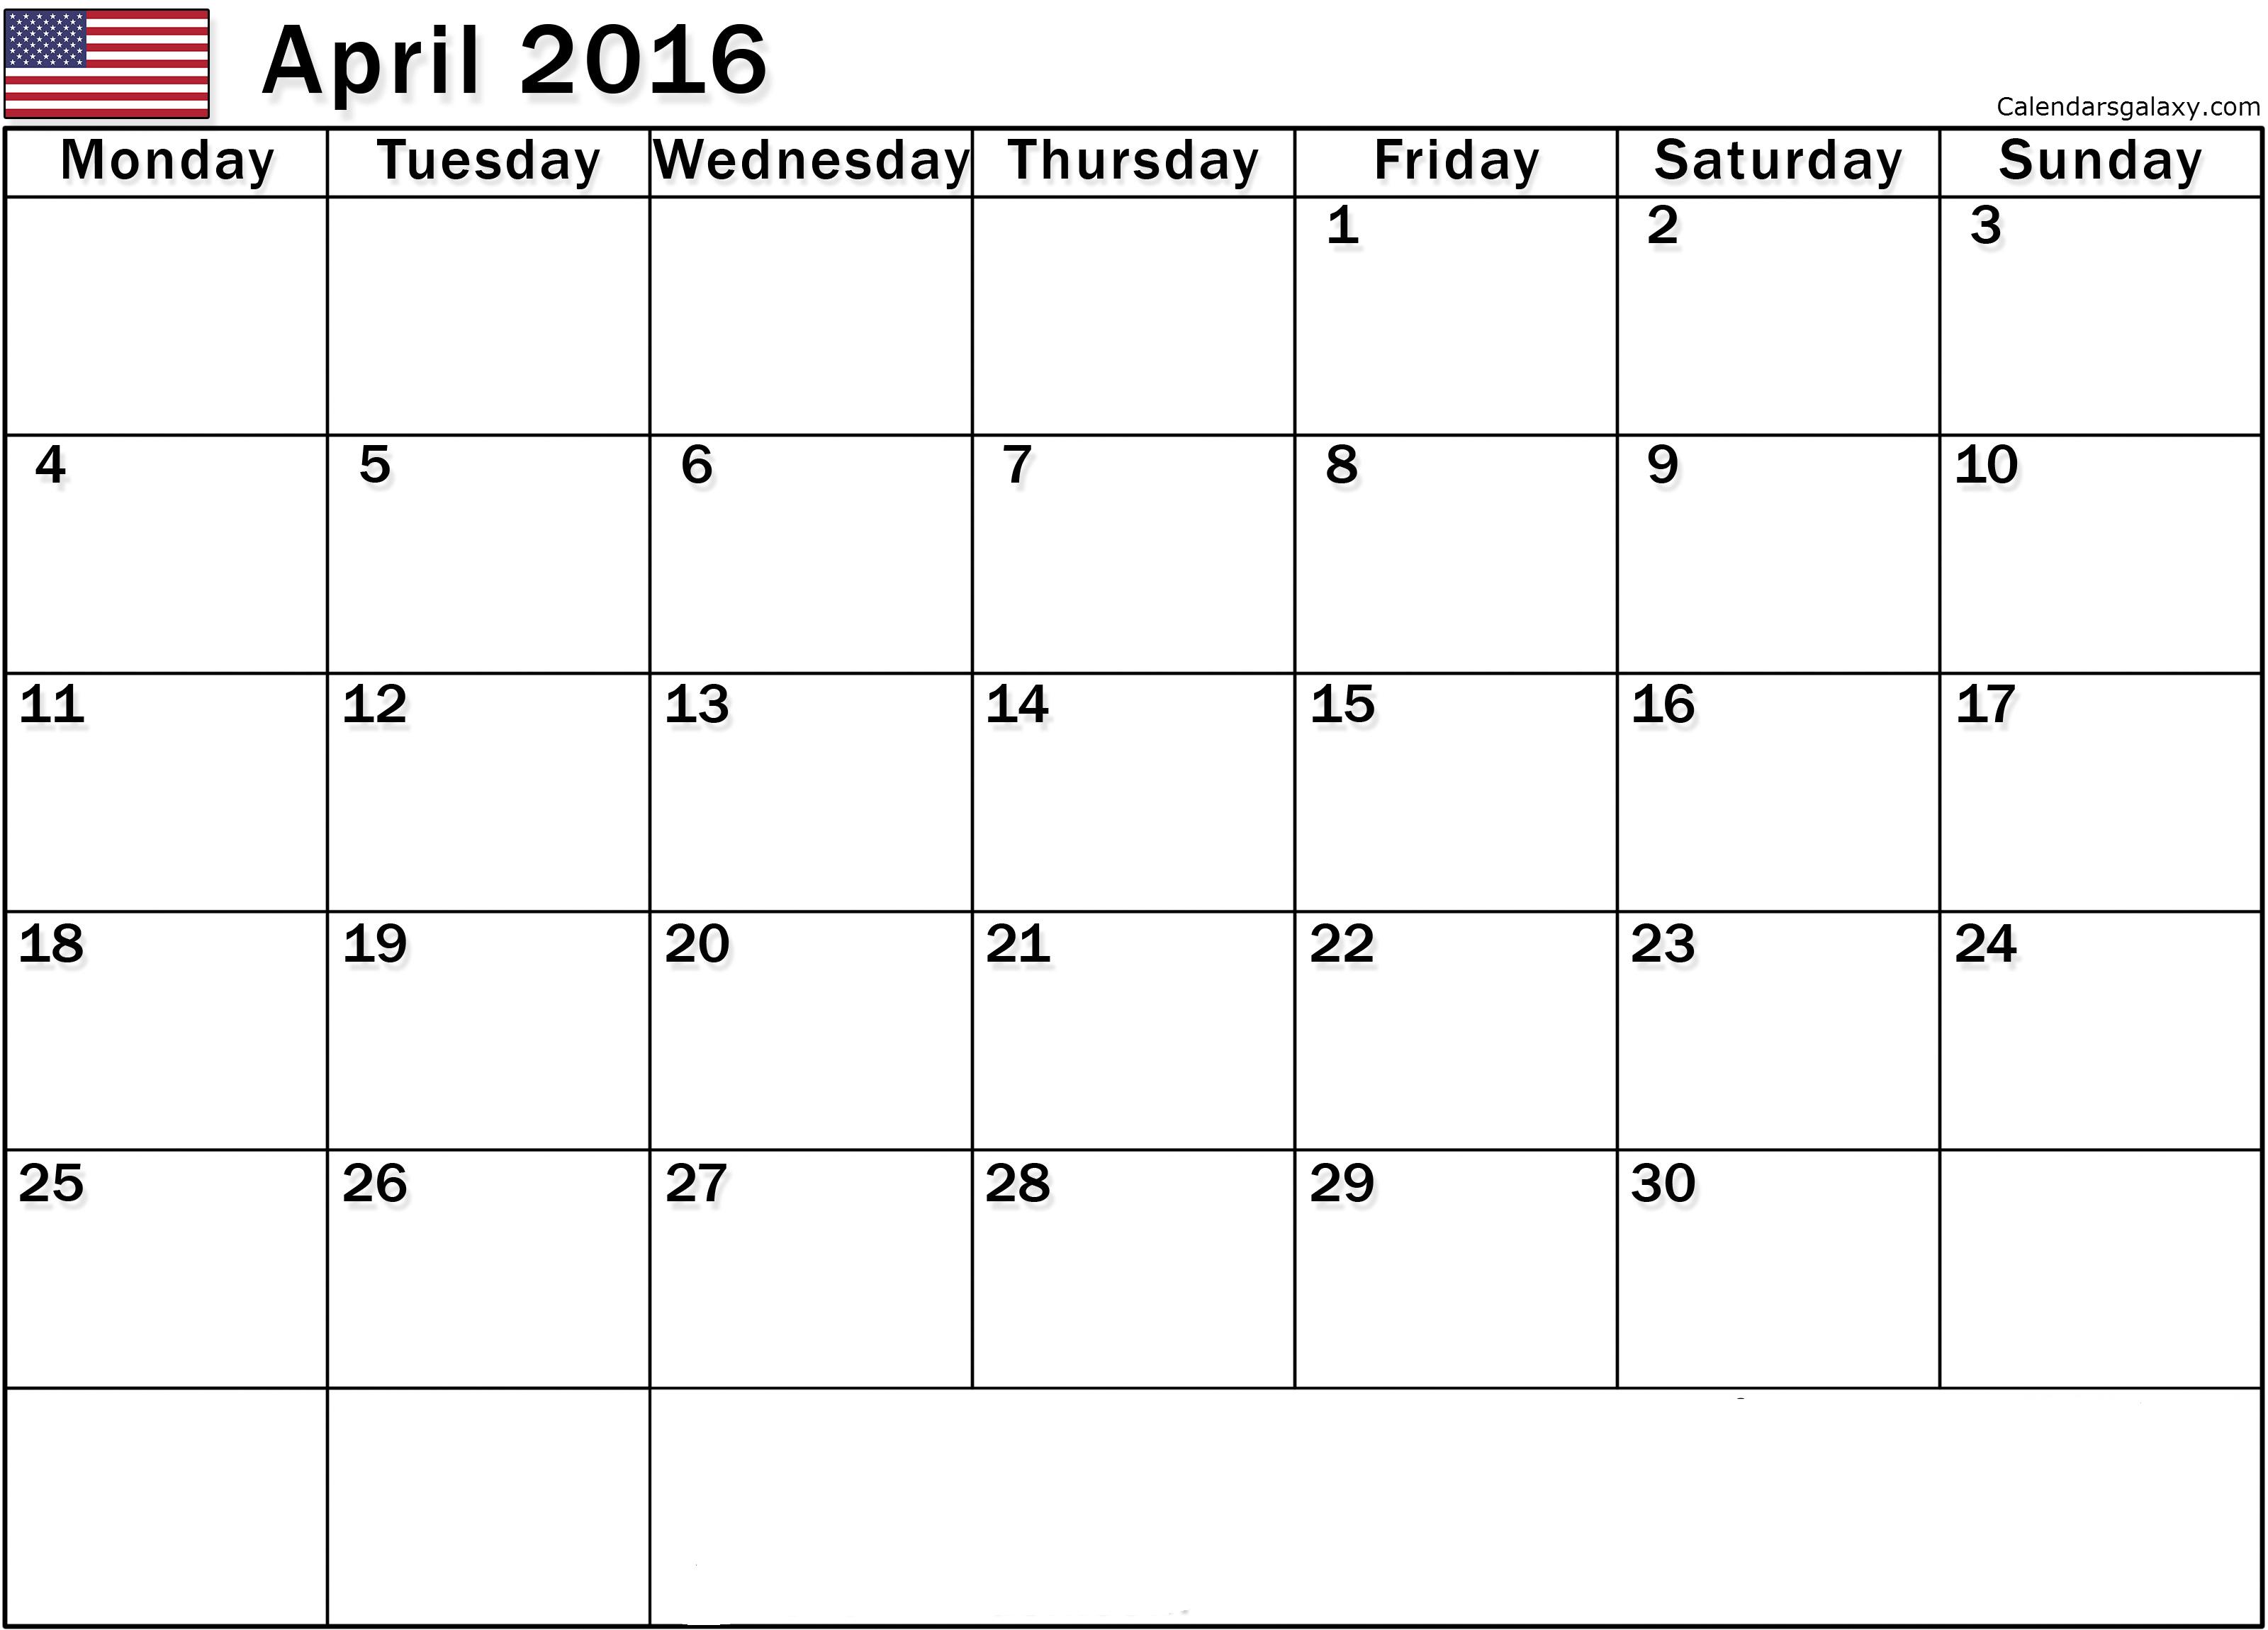 April 2016 Calendar Word Document